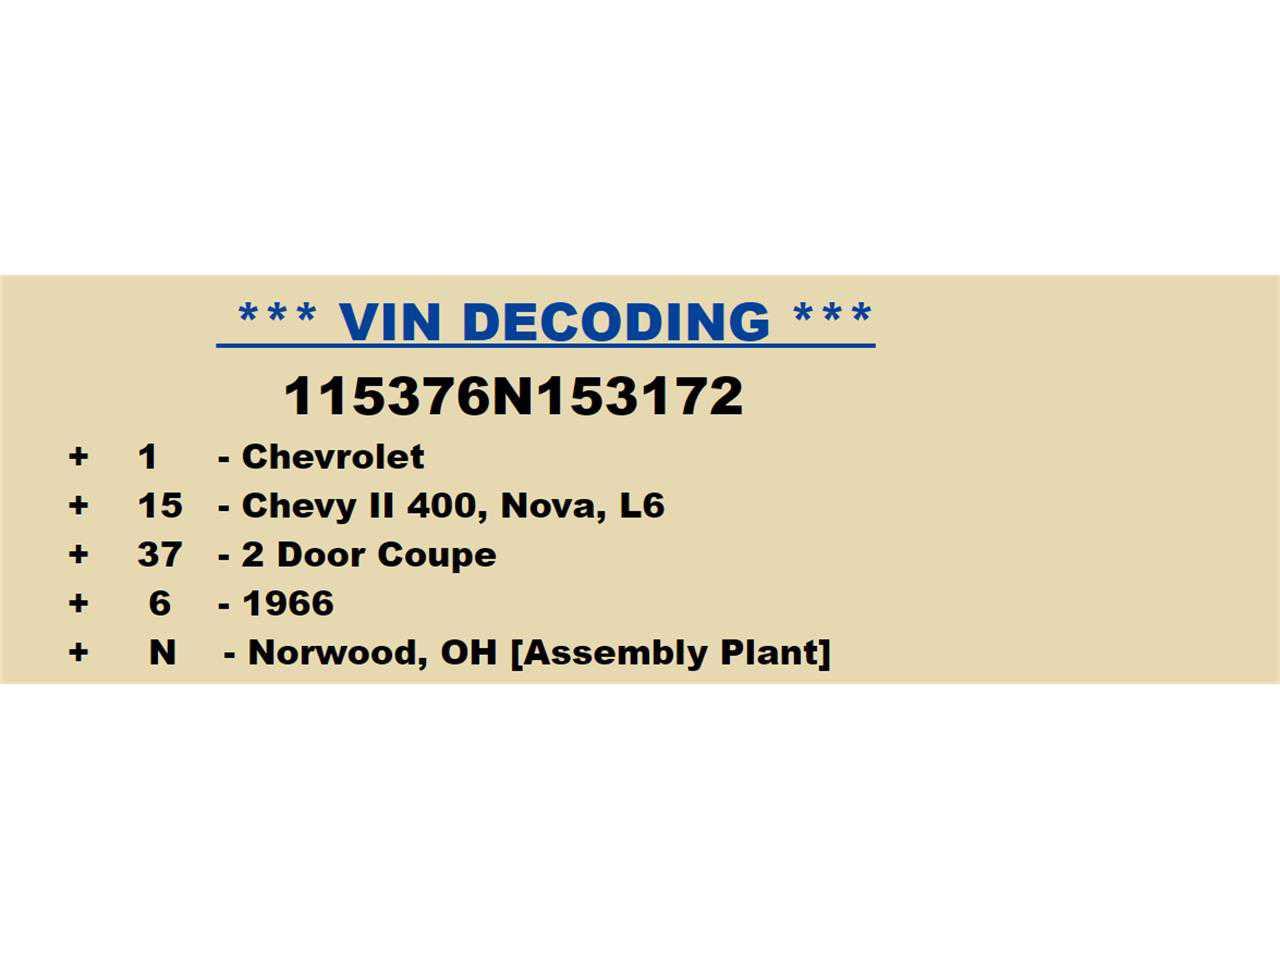 1966 Chevrolet Nova II SS for sale in Eustis, FL | 115376N153172